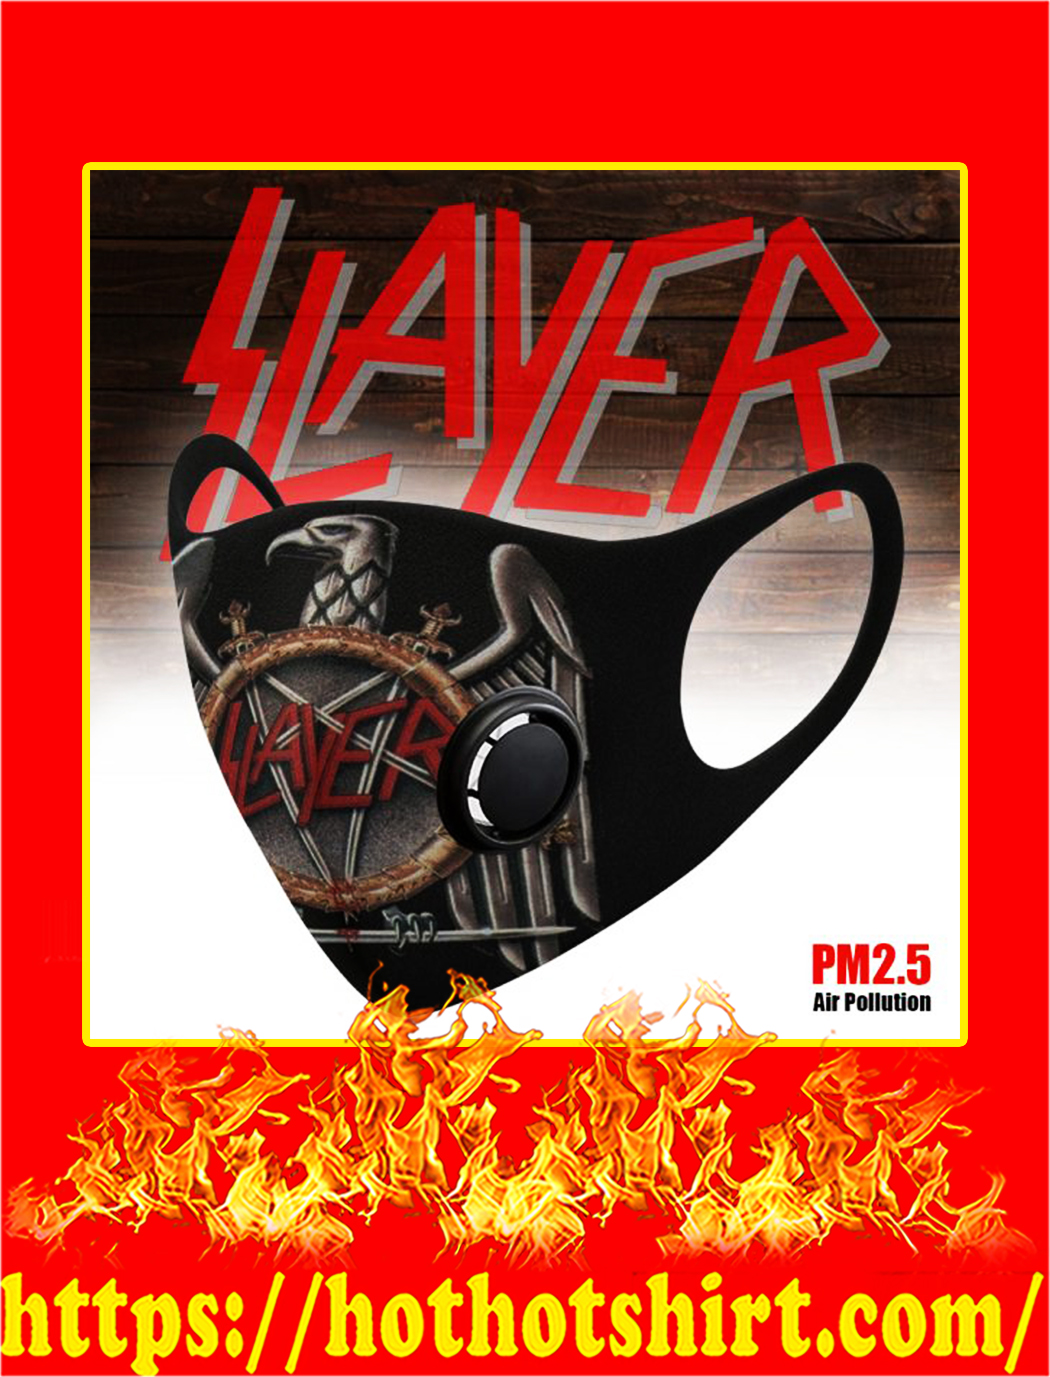 Slayer band filter face mask